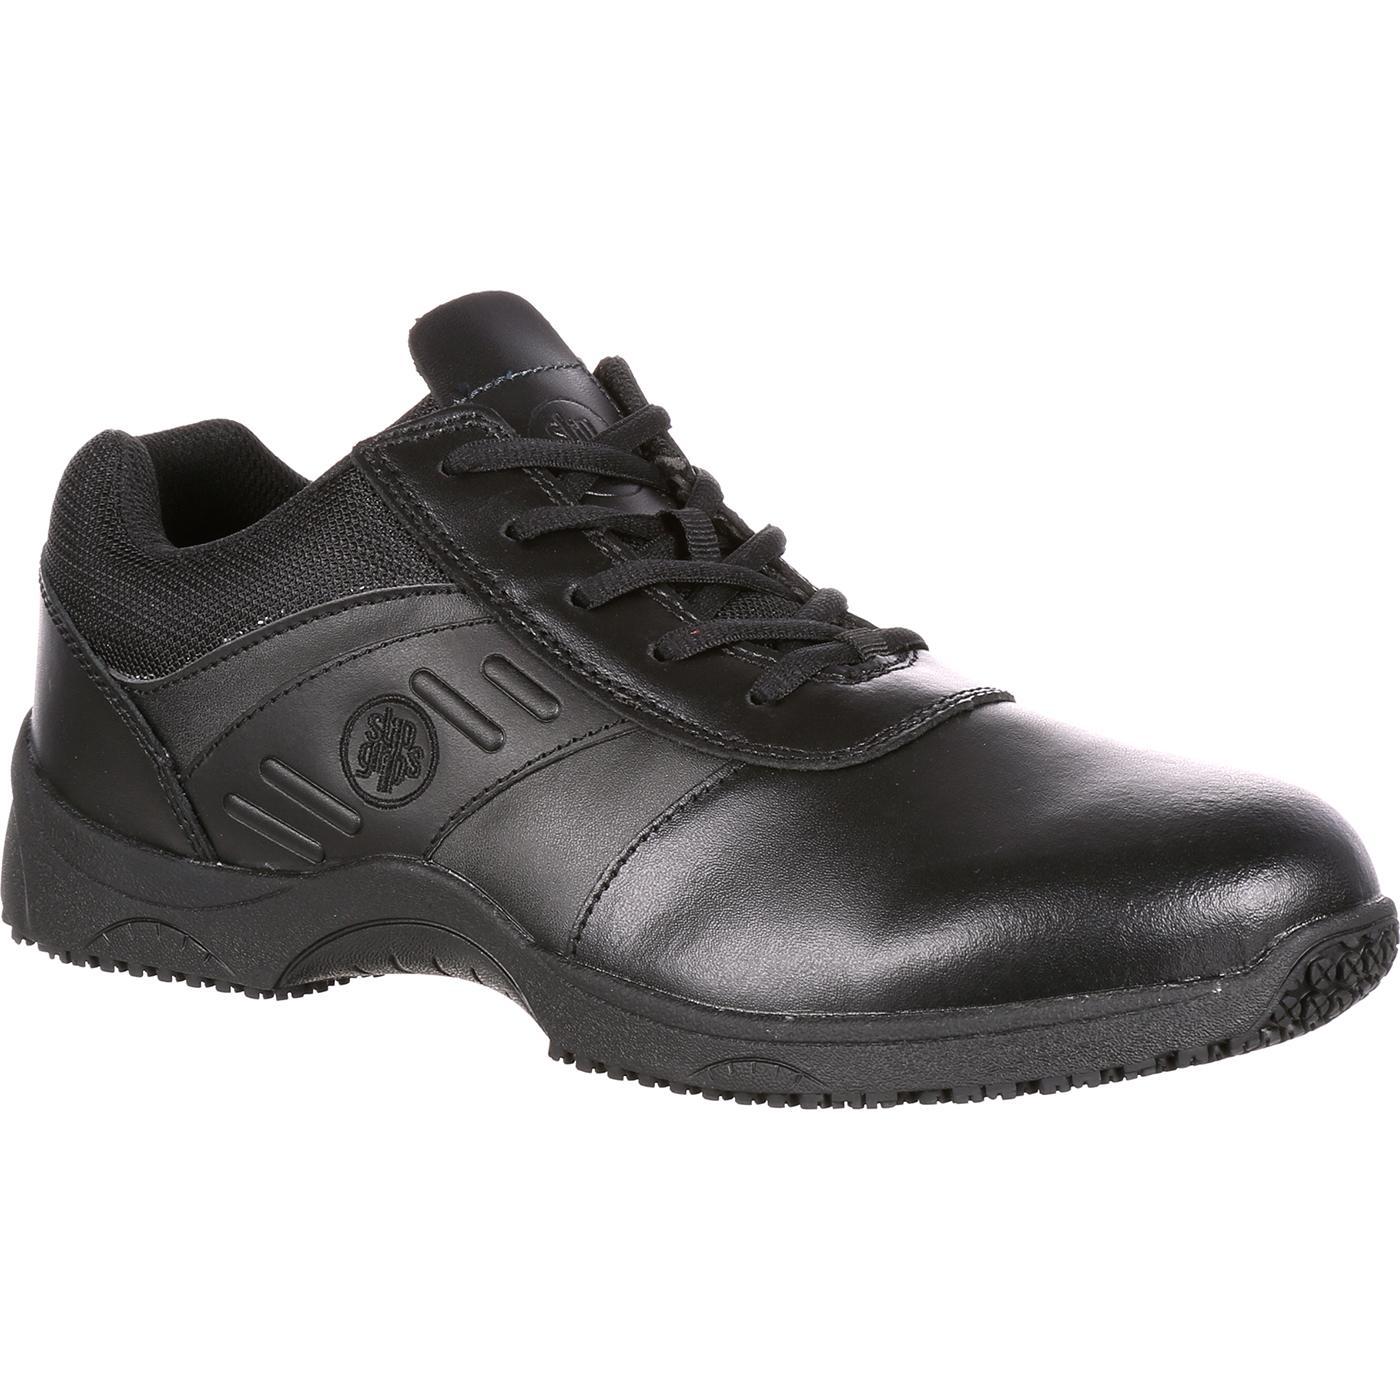 Rockport Works Slip Resistant Lace Up Shoes